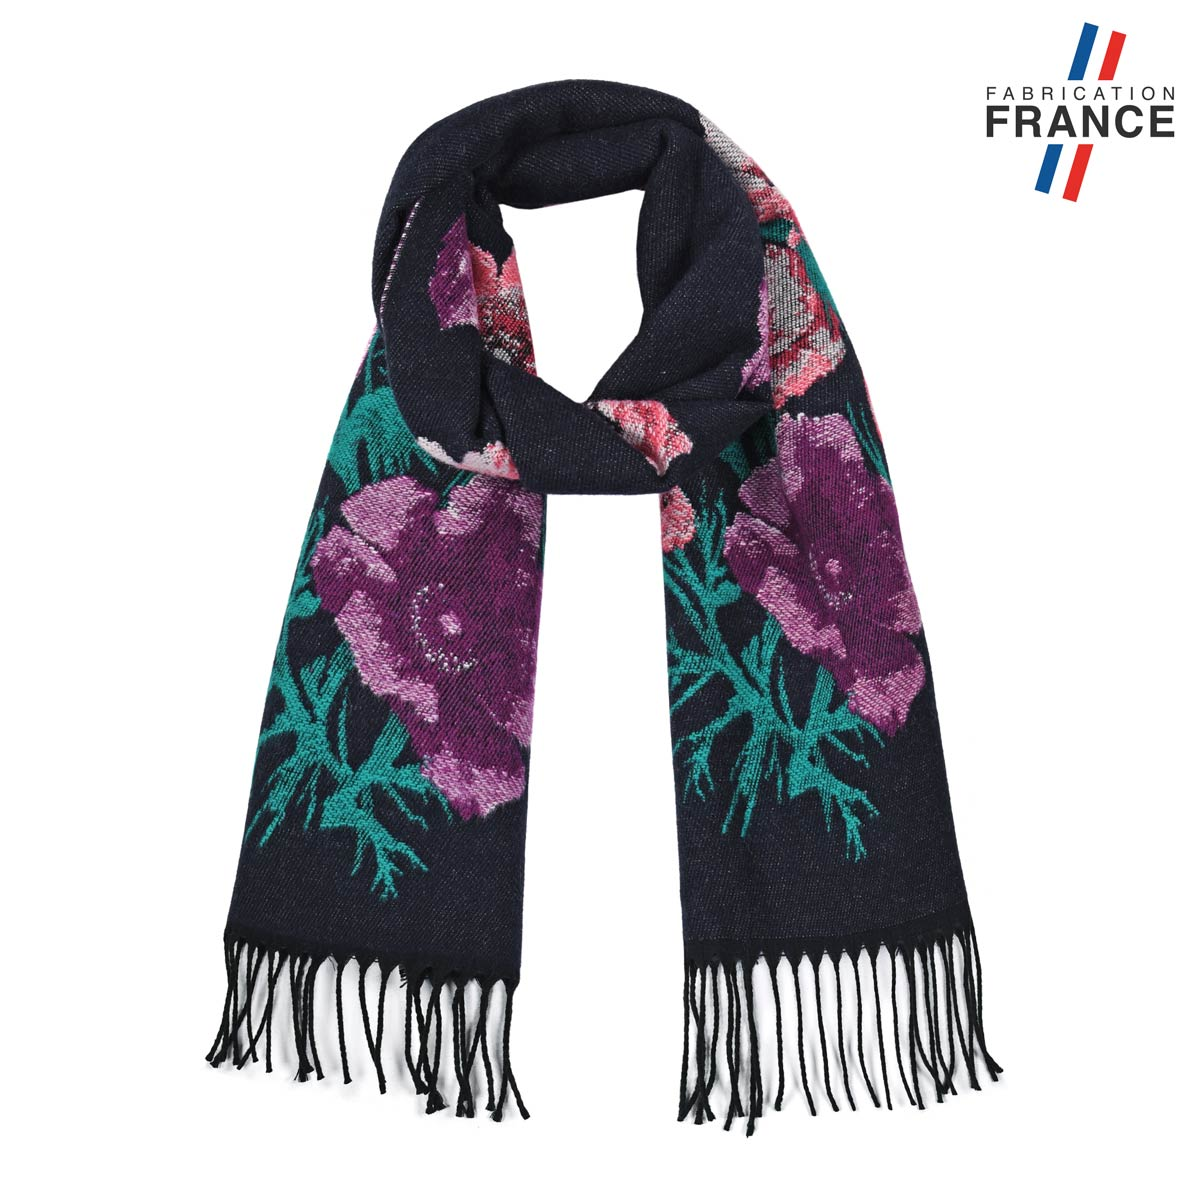 AT-05758_F12-1FR_Echarpe-florale-noire-violet